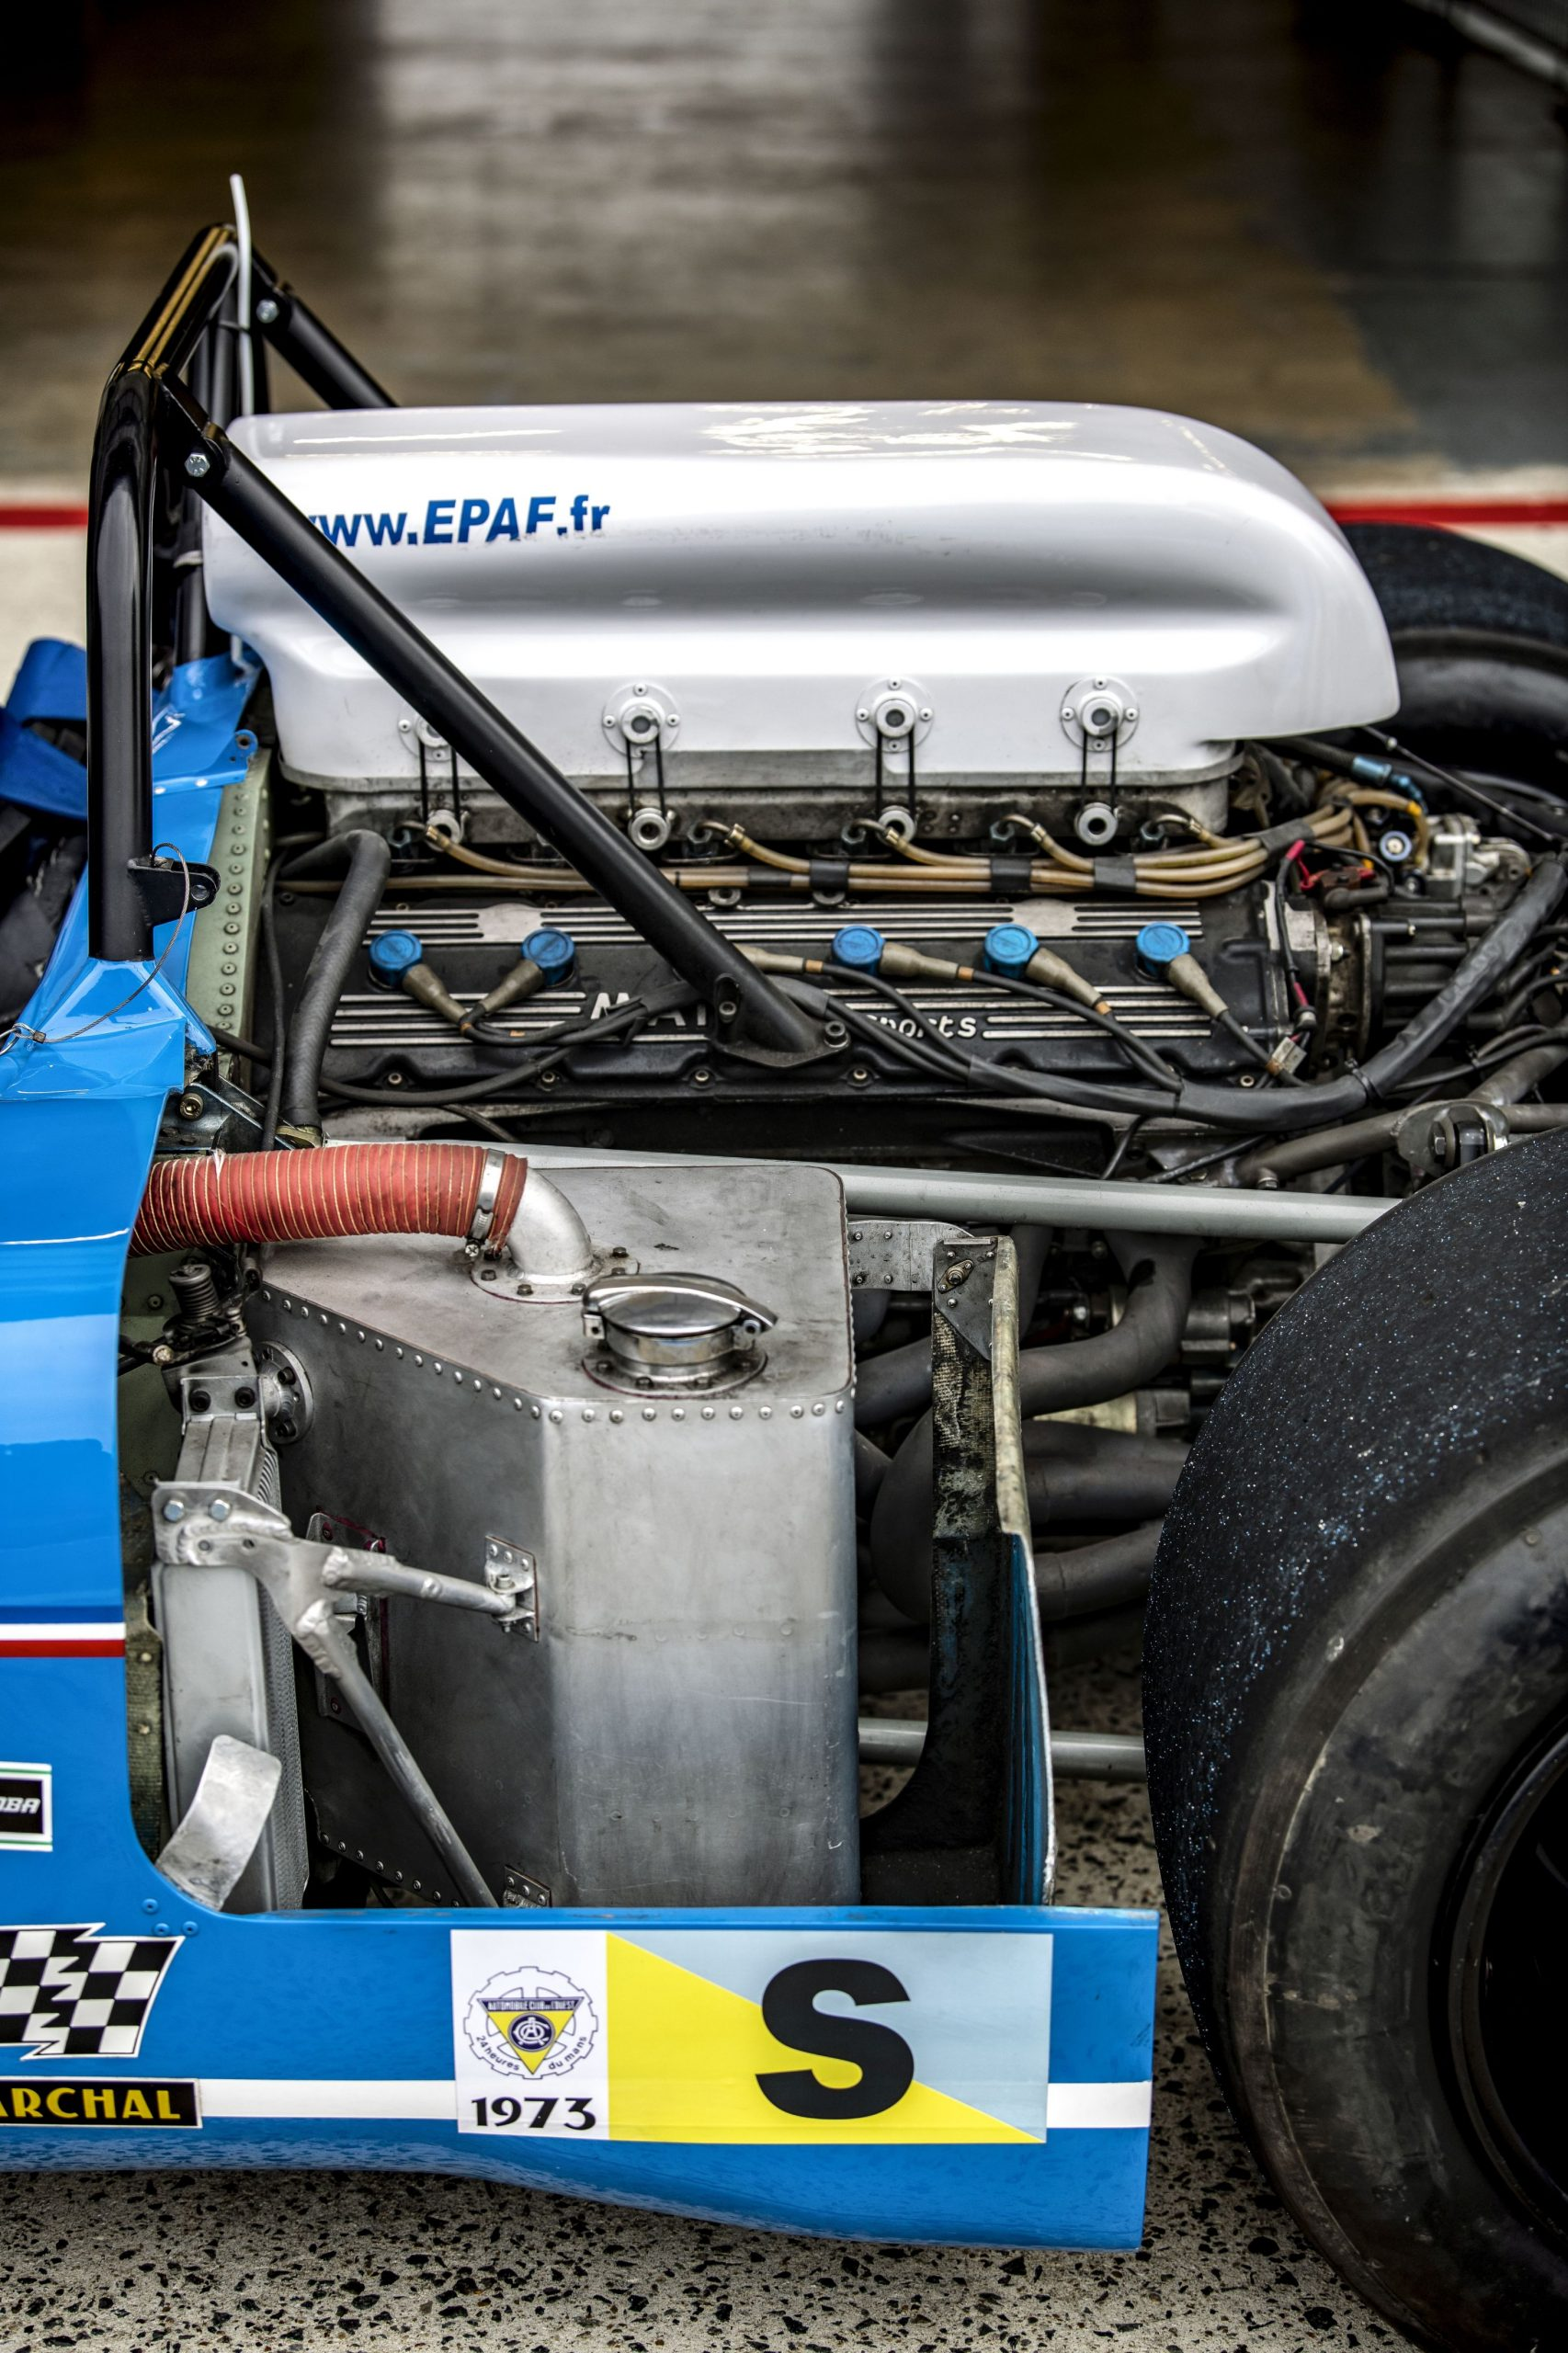 1972 Matra MS 670 engine side